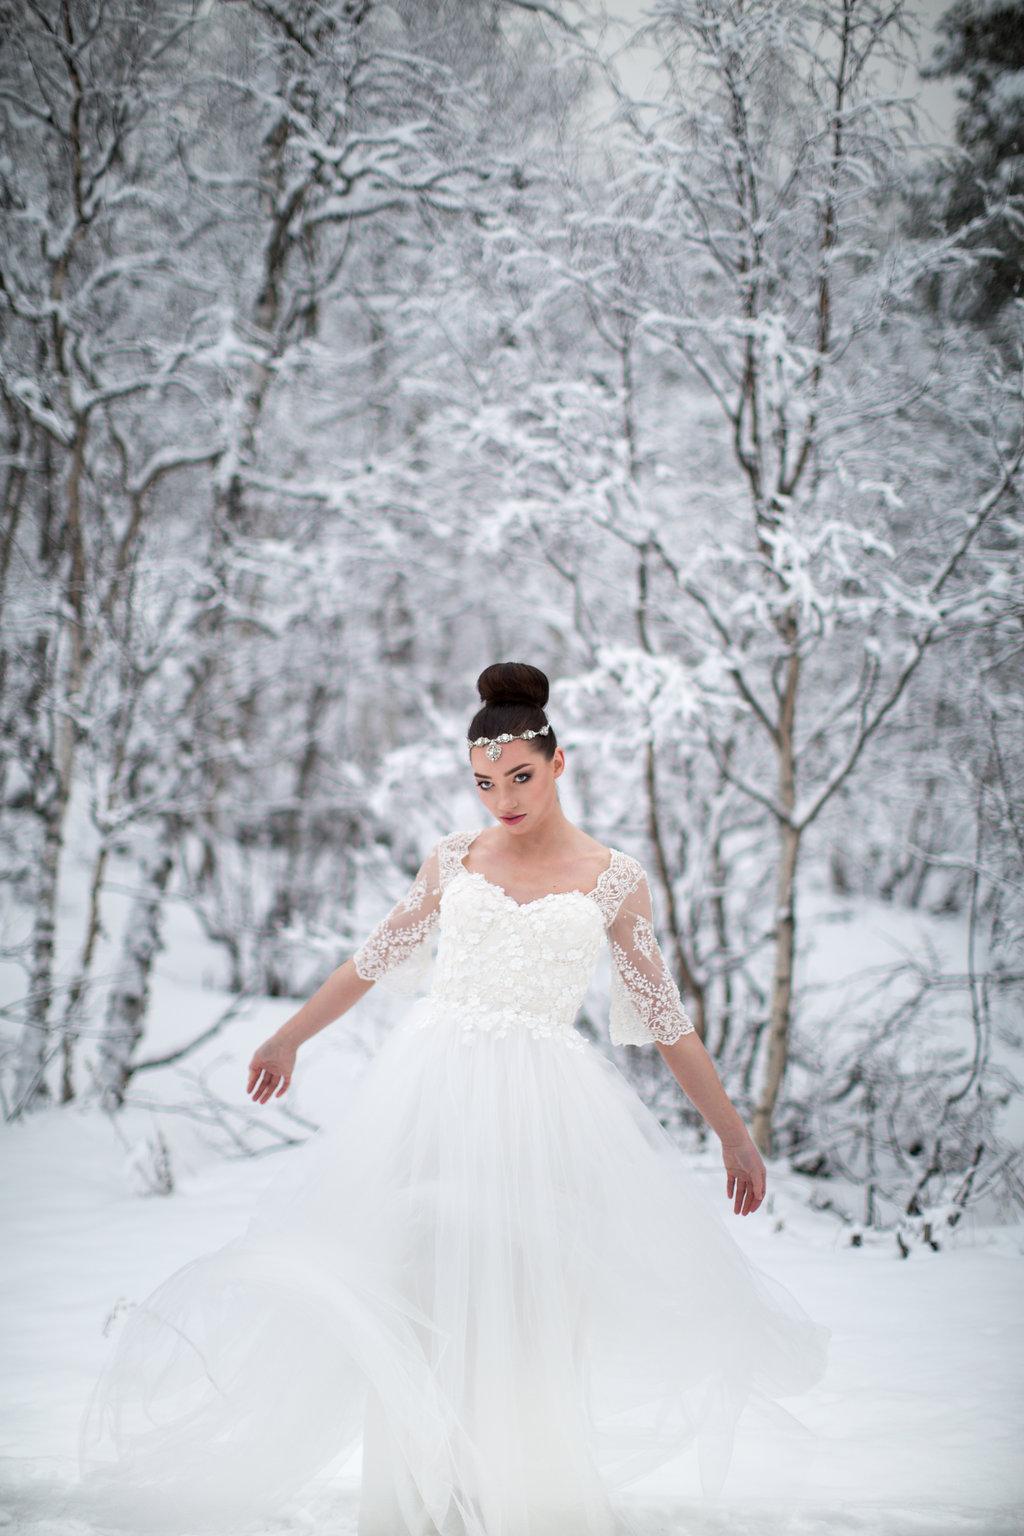 Edera Jewelry Blog | Winter Wedding Gown and Headpiece